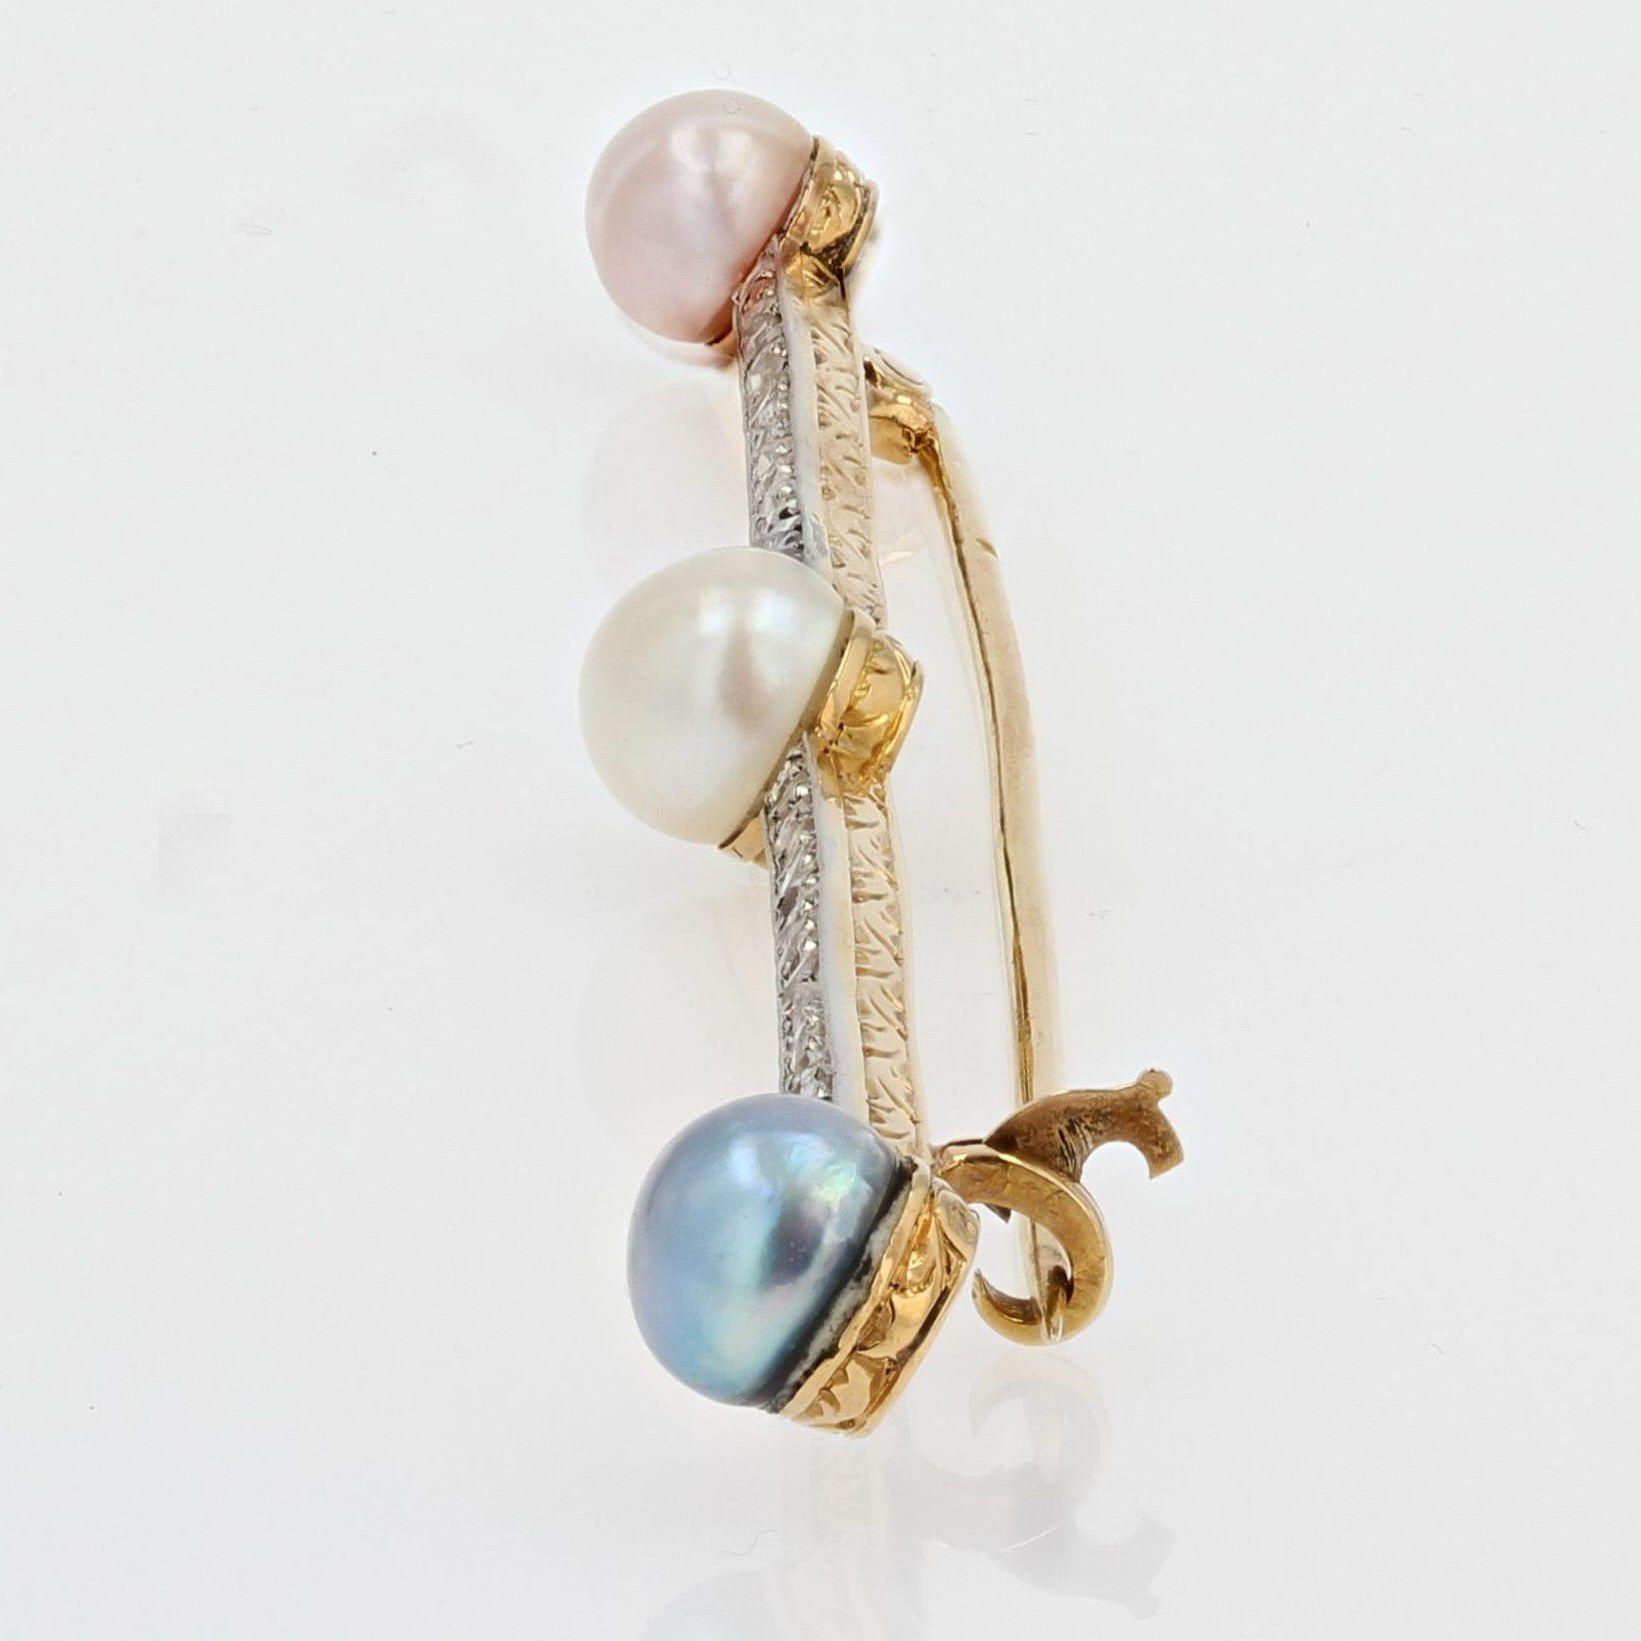 Broche ancienne diamants perles fines